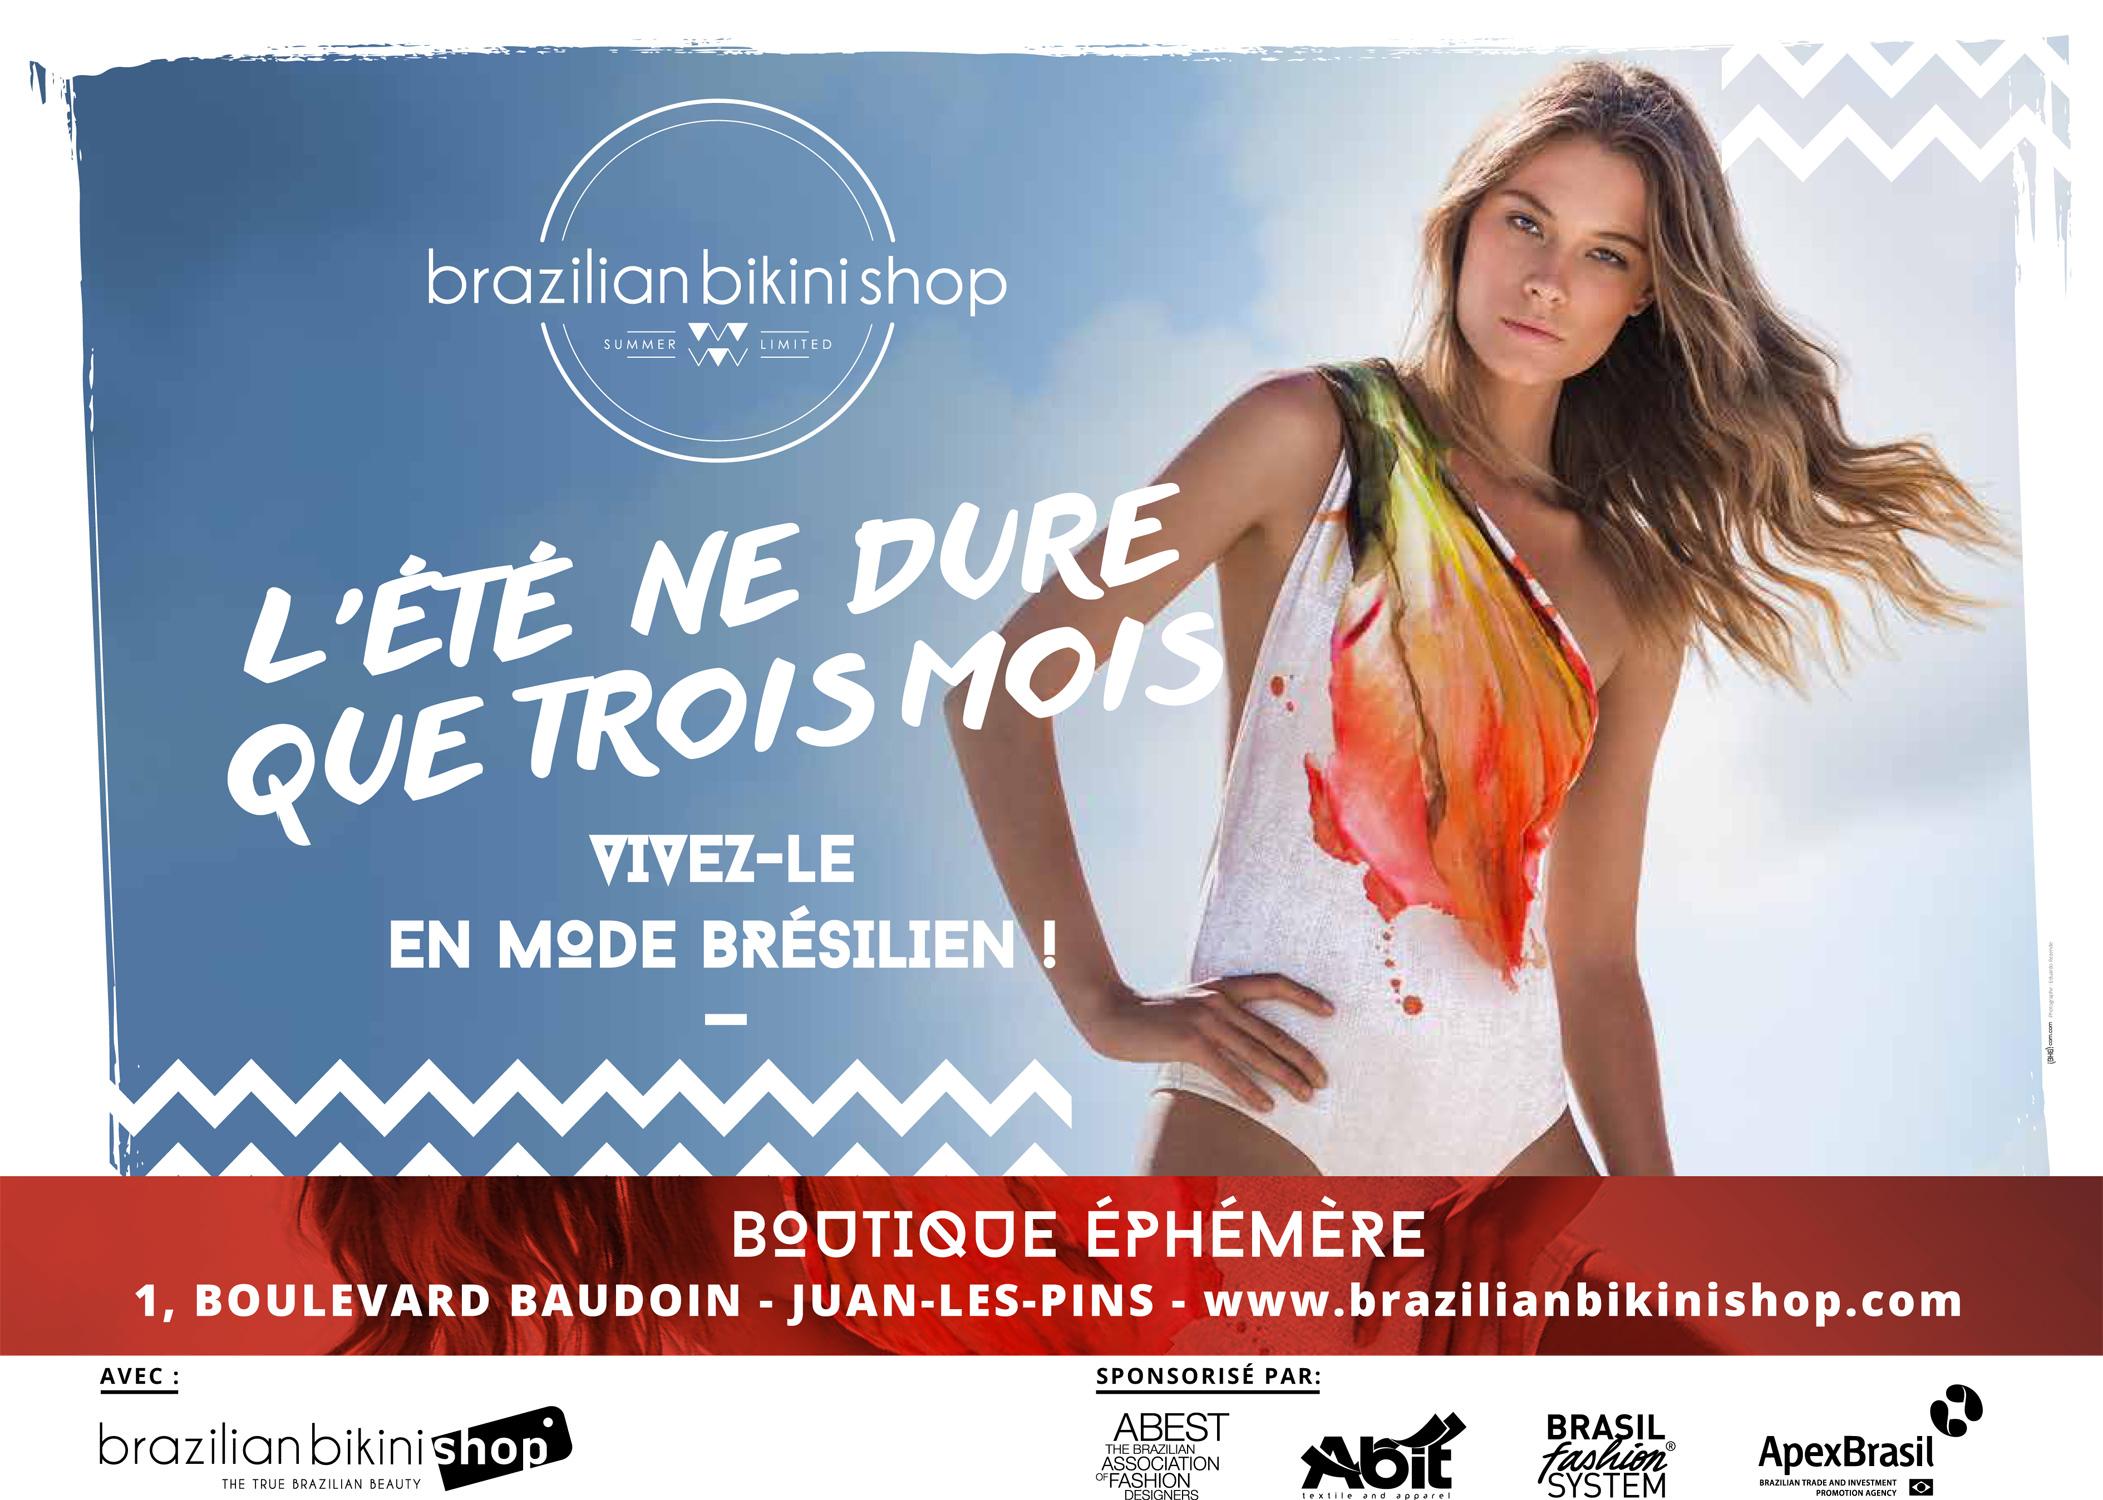 Loja-temporaria-pop-up-store-moda-praia-brasileira-cote-dazur-riviera-francesa-5